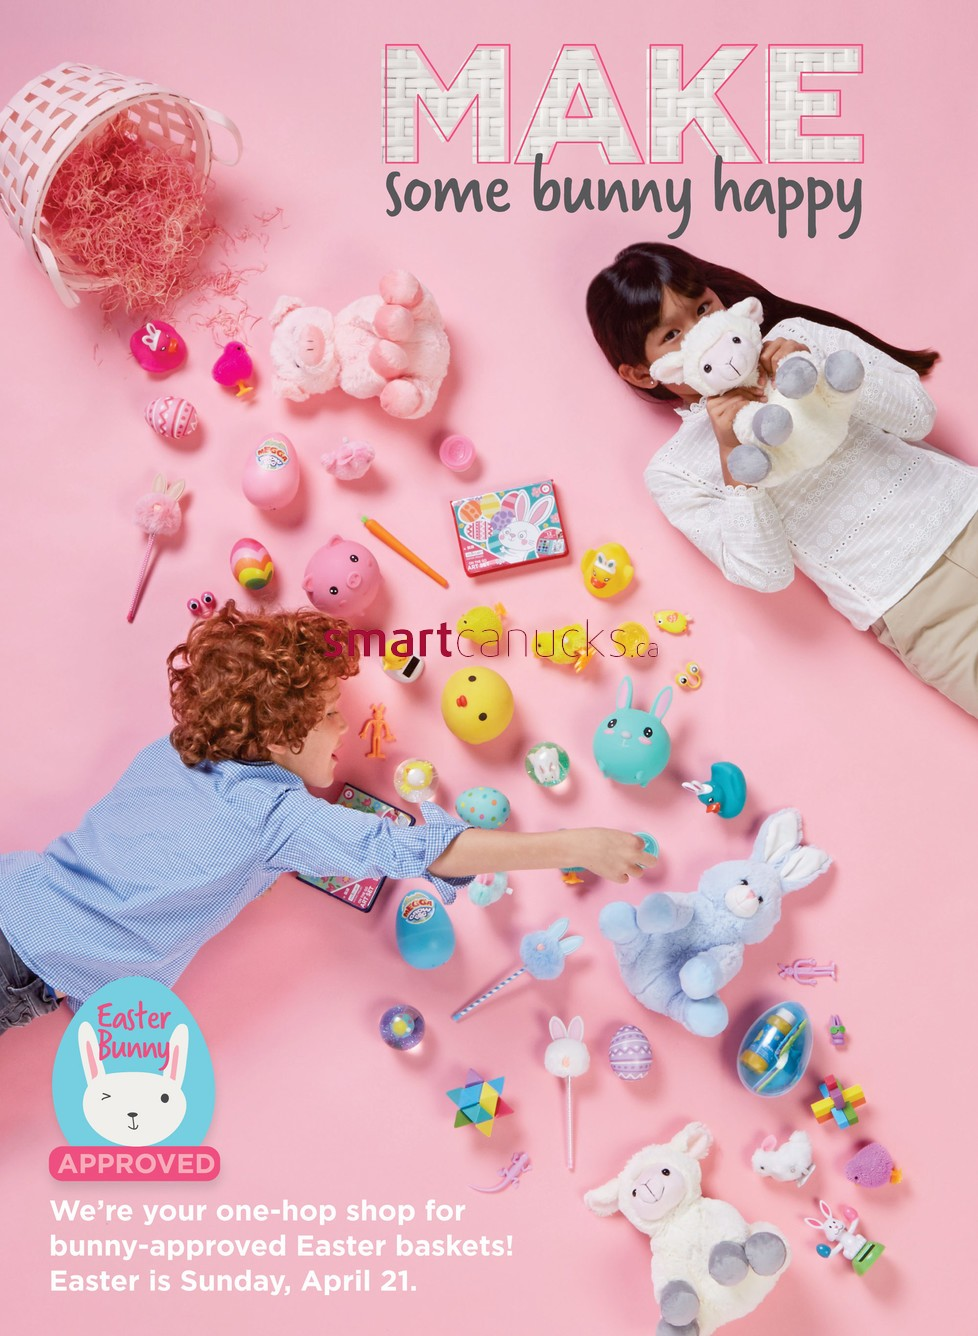 217417bdb3 Michael's Kids Easter LookBook February 25 to April 21